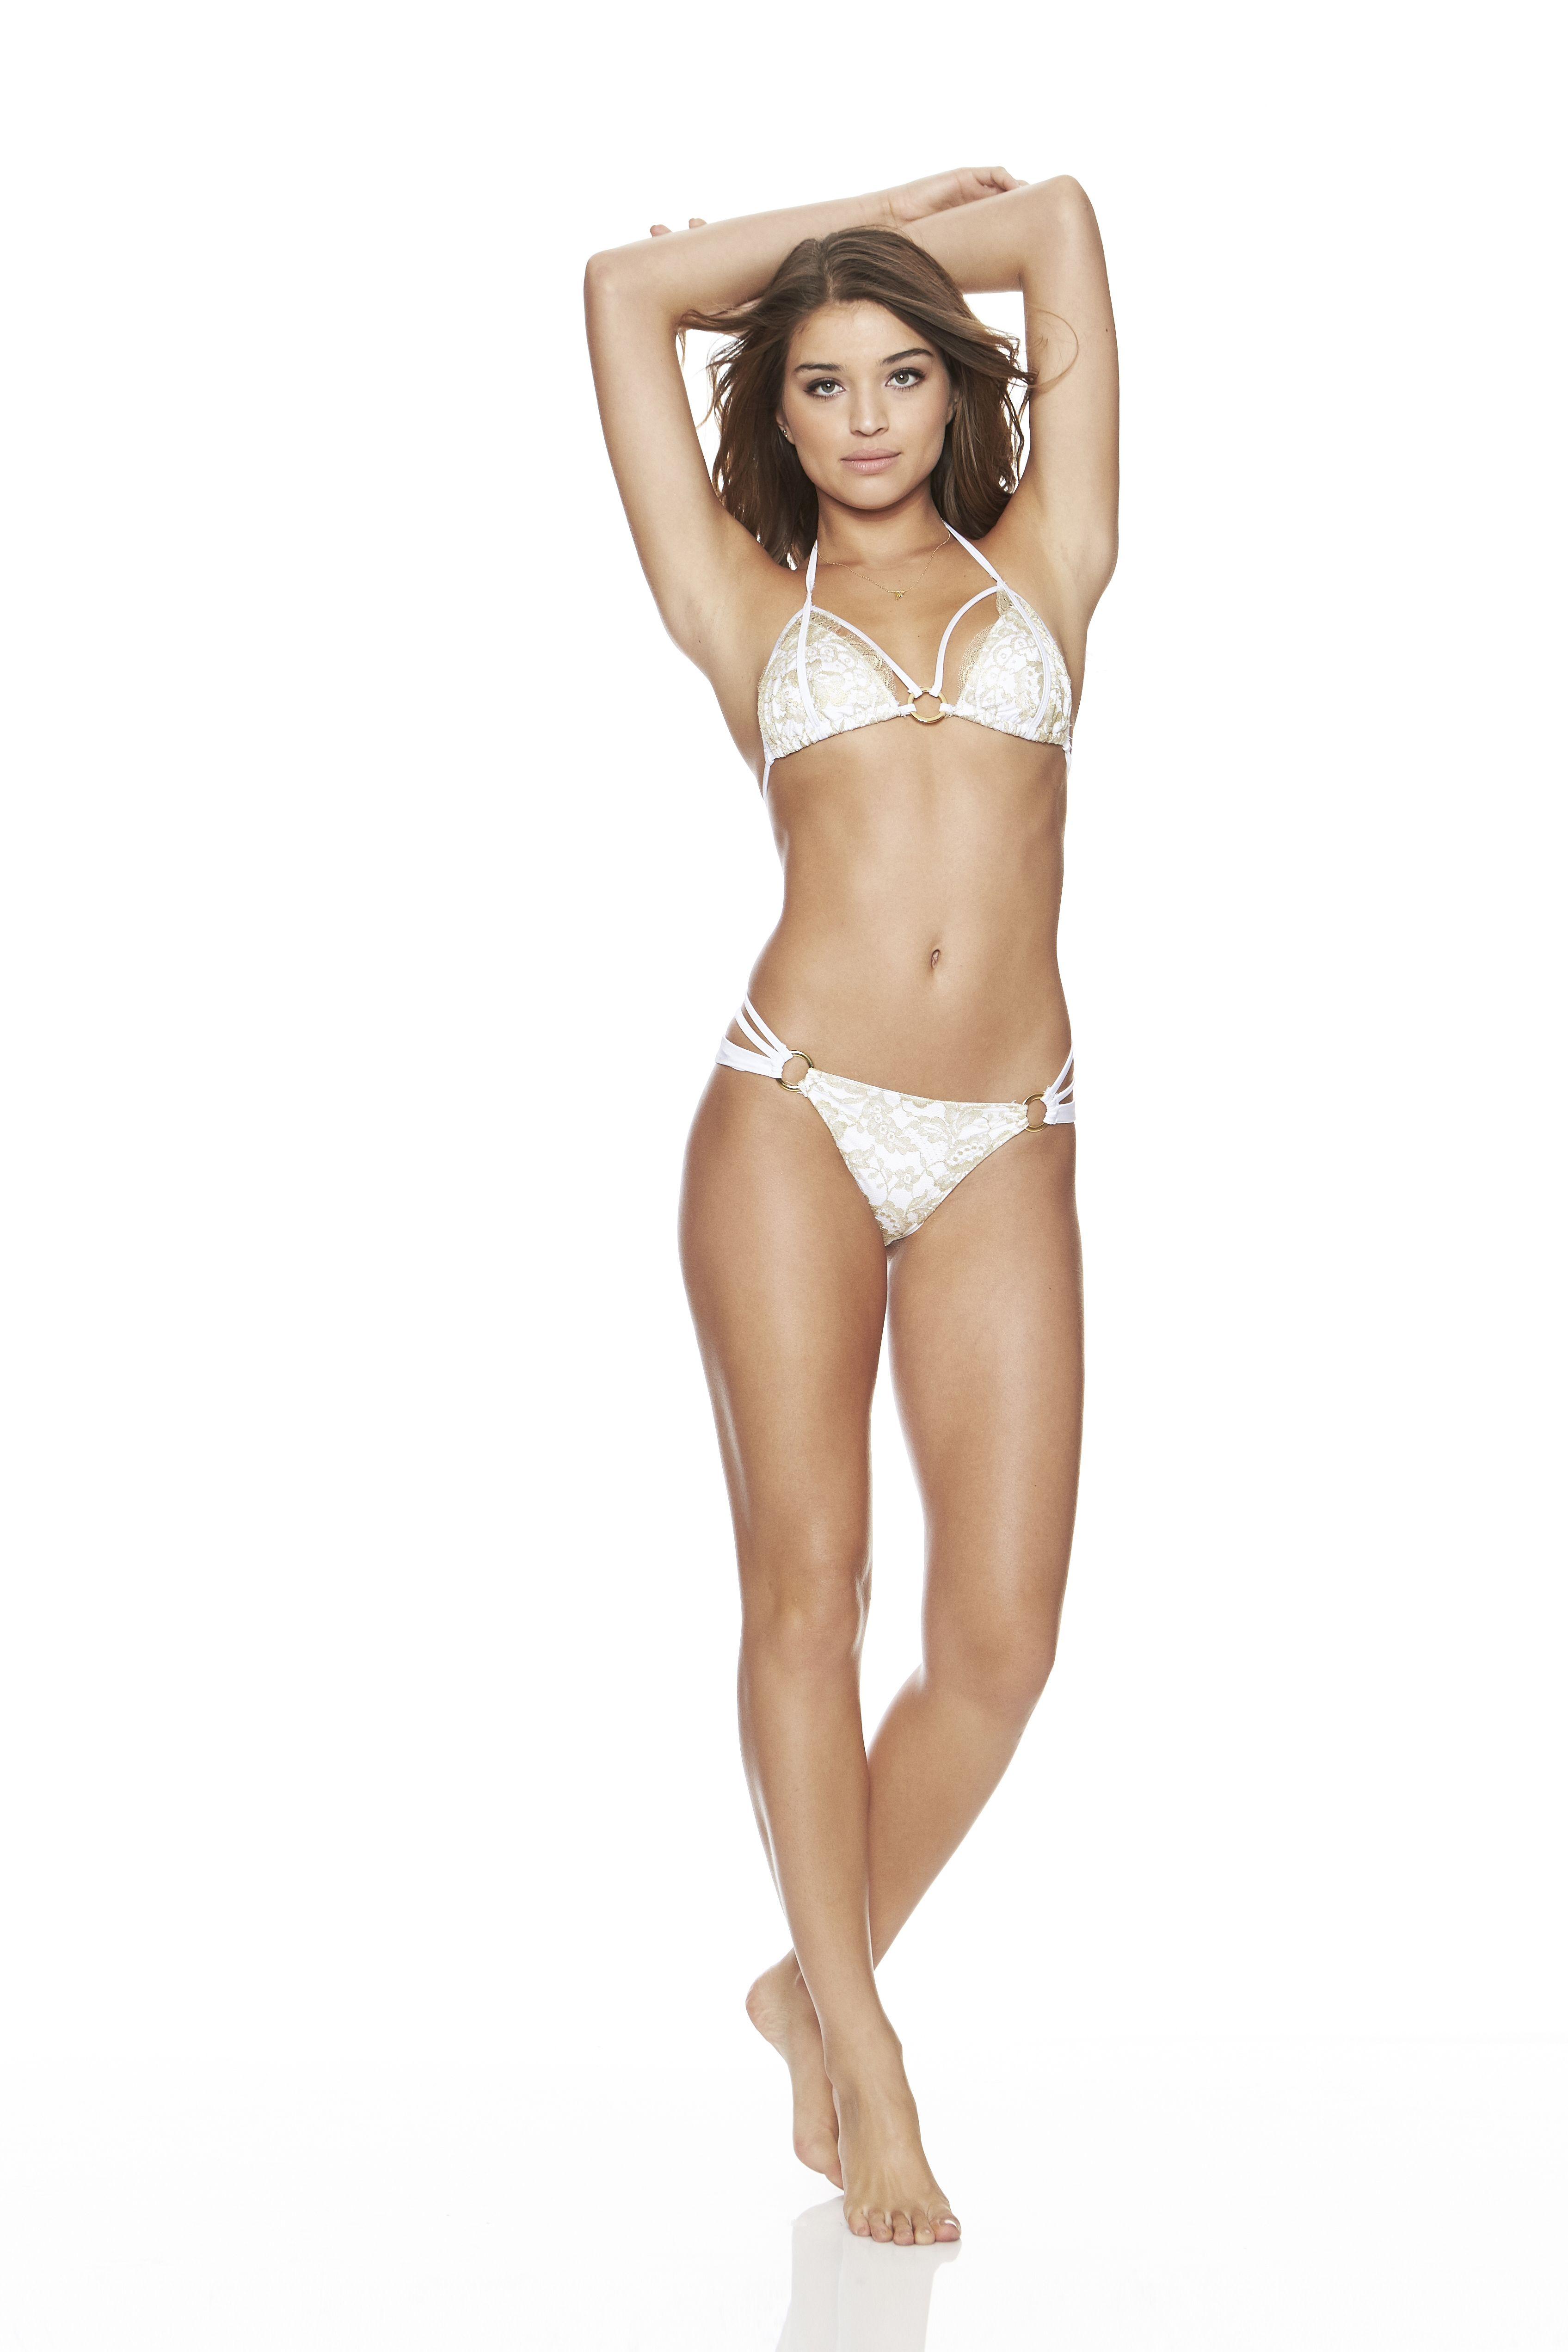 Sexy pics of Daniela Lopez Osorio   The Fappening - News